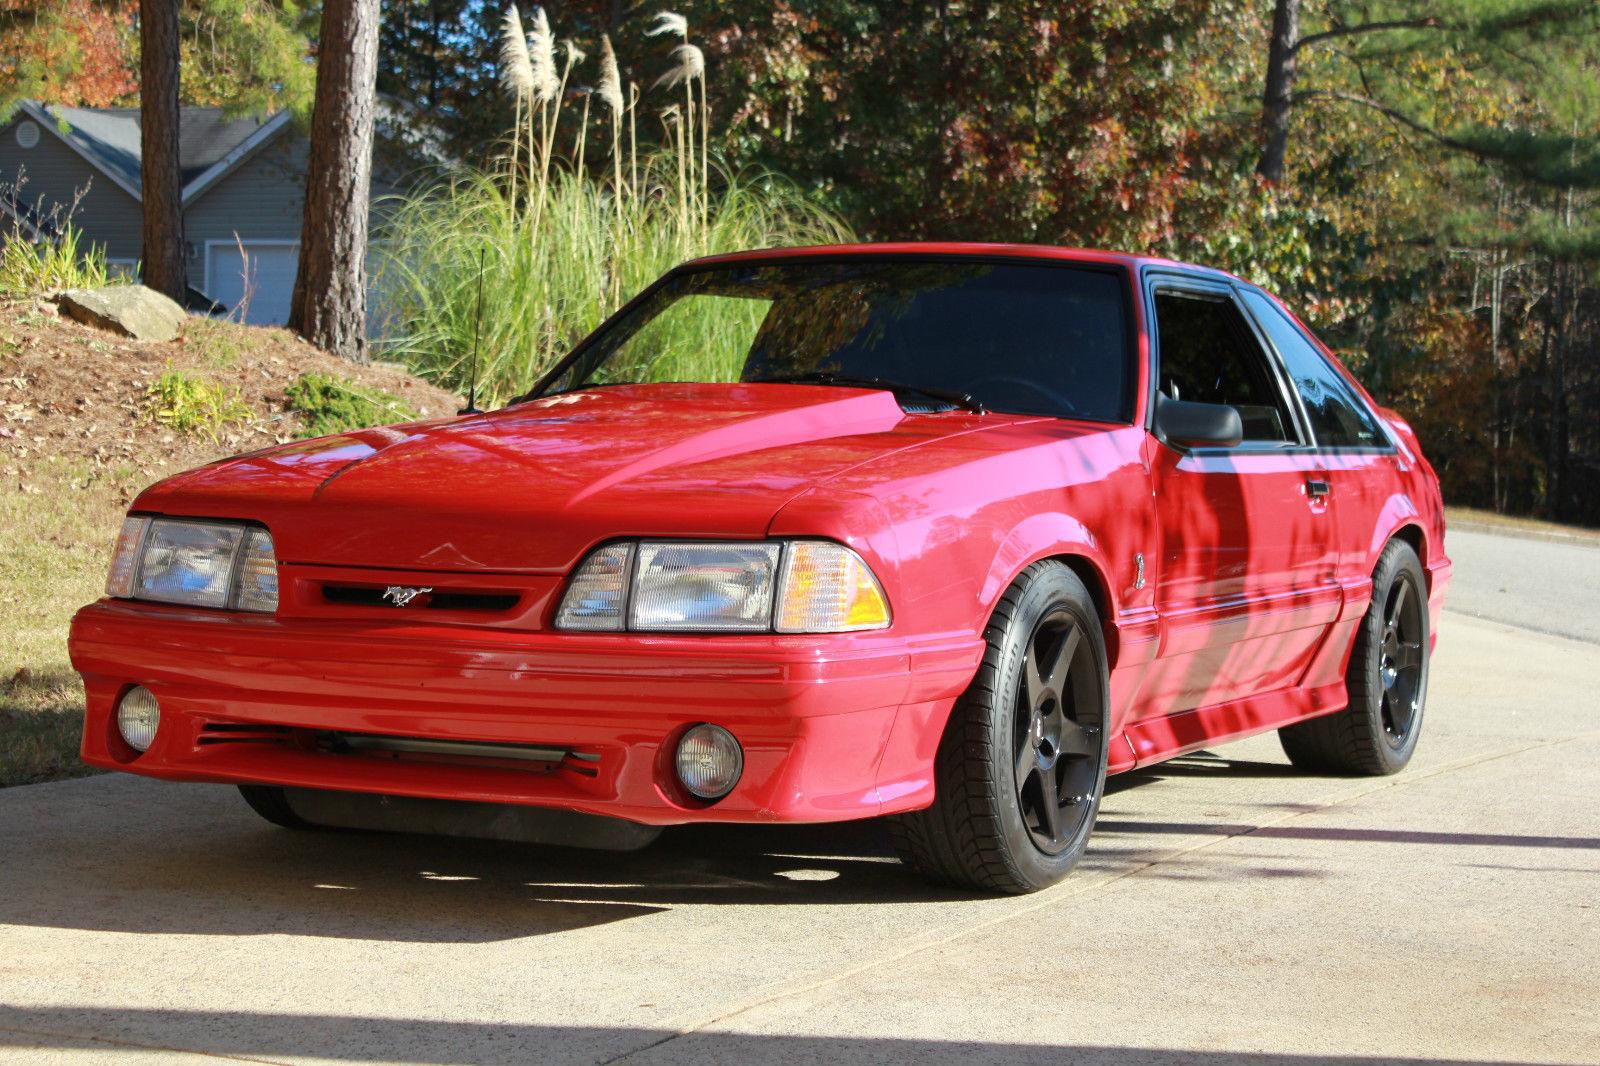 1991 Ford Mustang Gt Cobra Hatchback 2 Door 5 0l